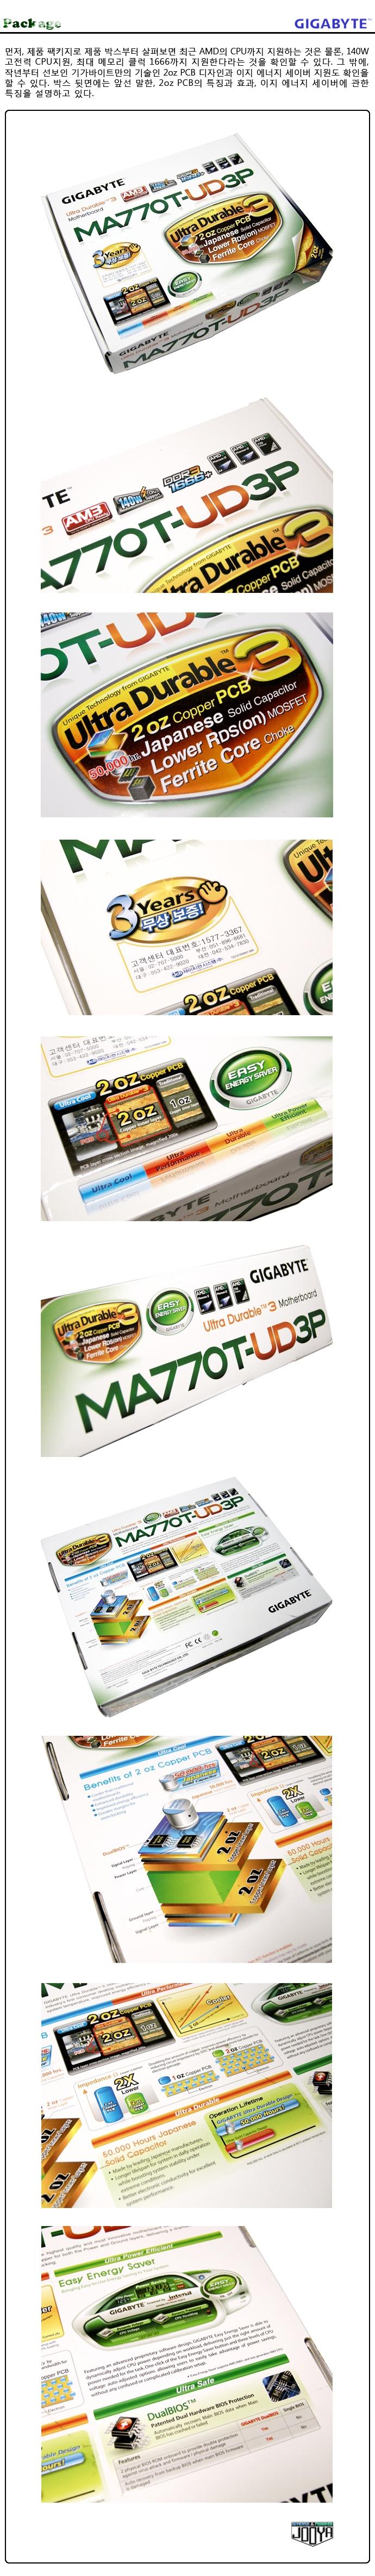 790FX메인보드도 부럽지않다.막강 770 메인보드! - 기가바이트 GA-MA770T-UD3P